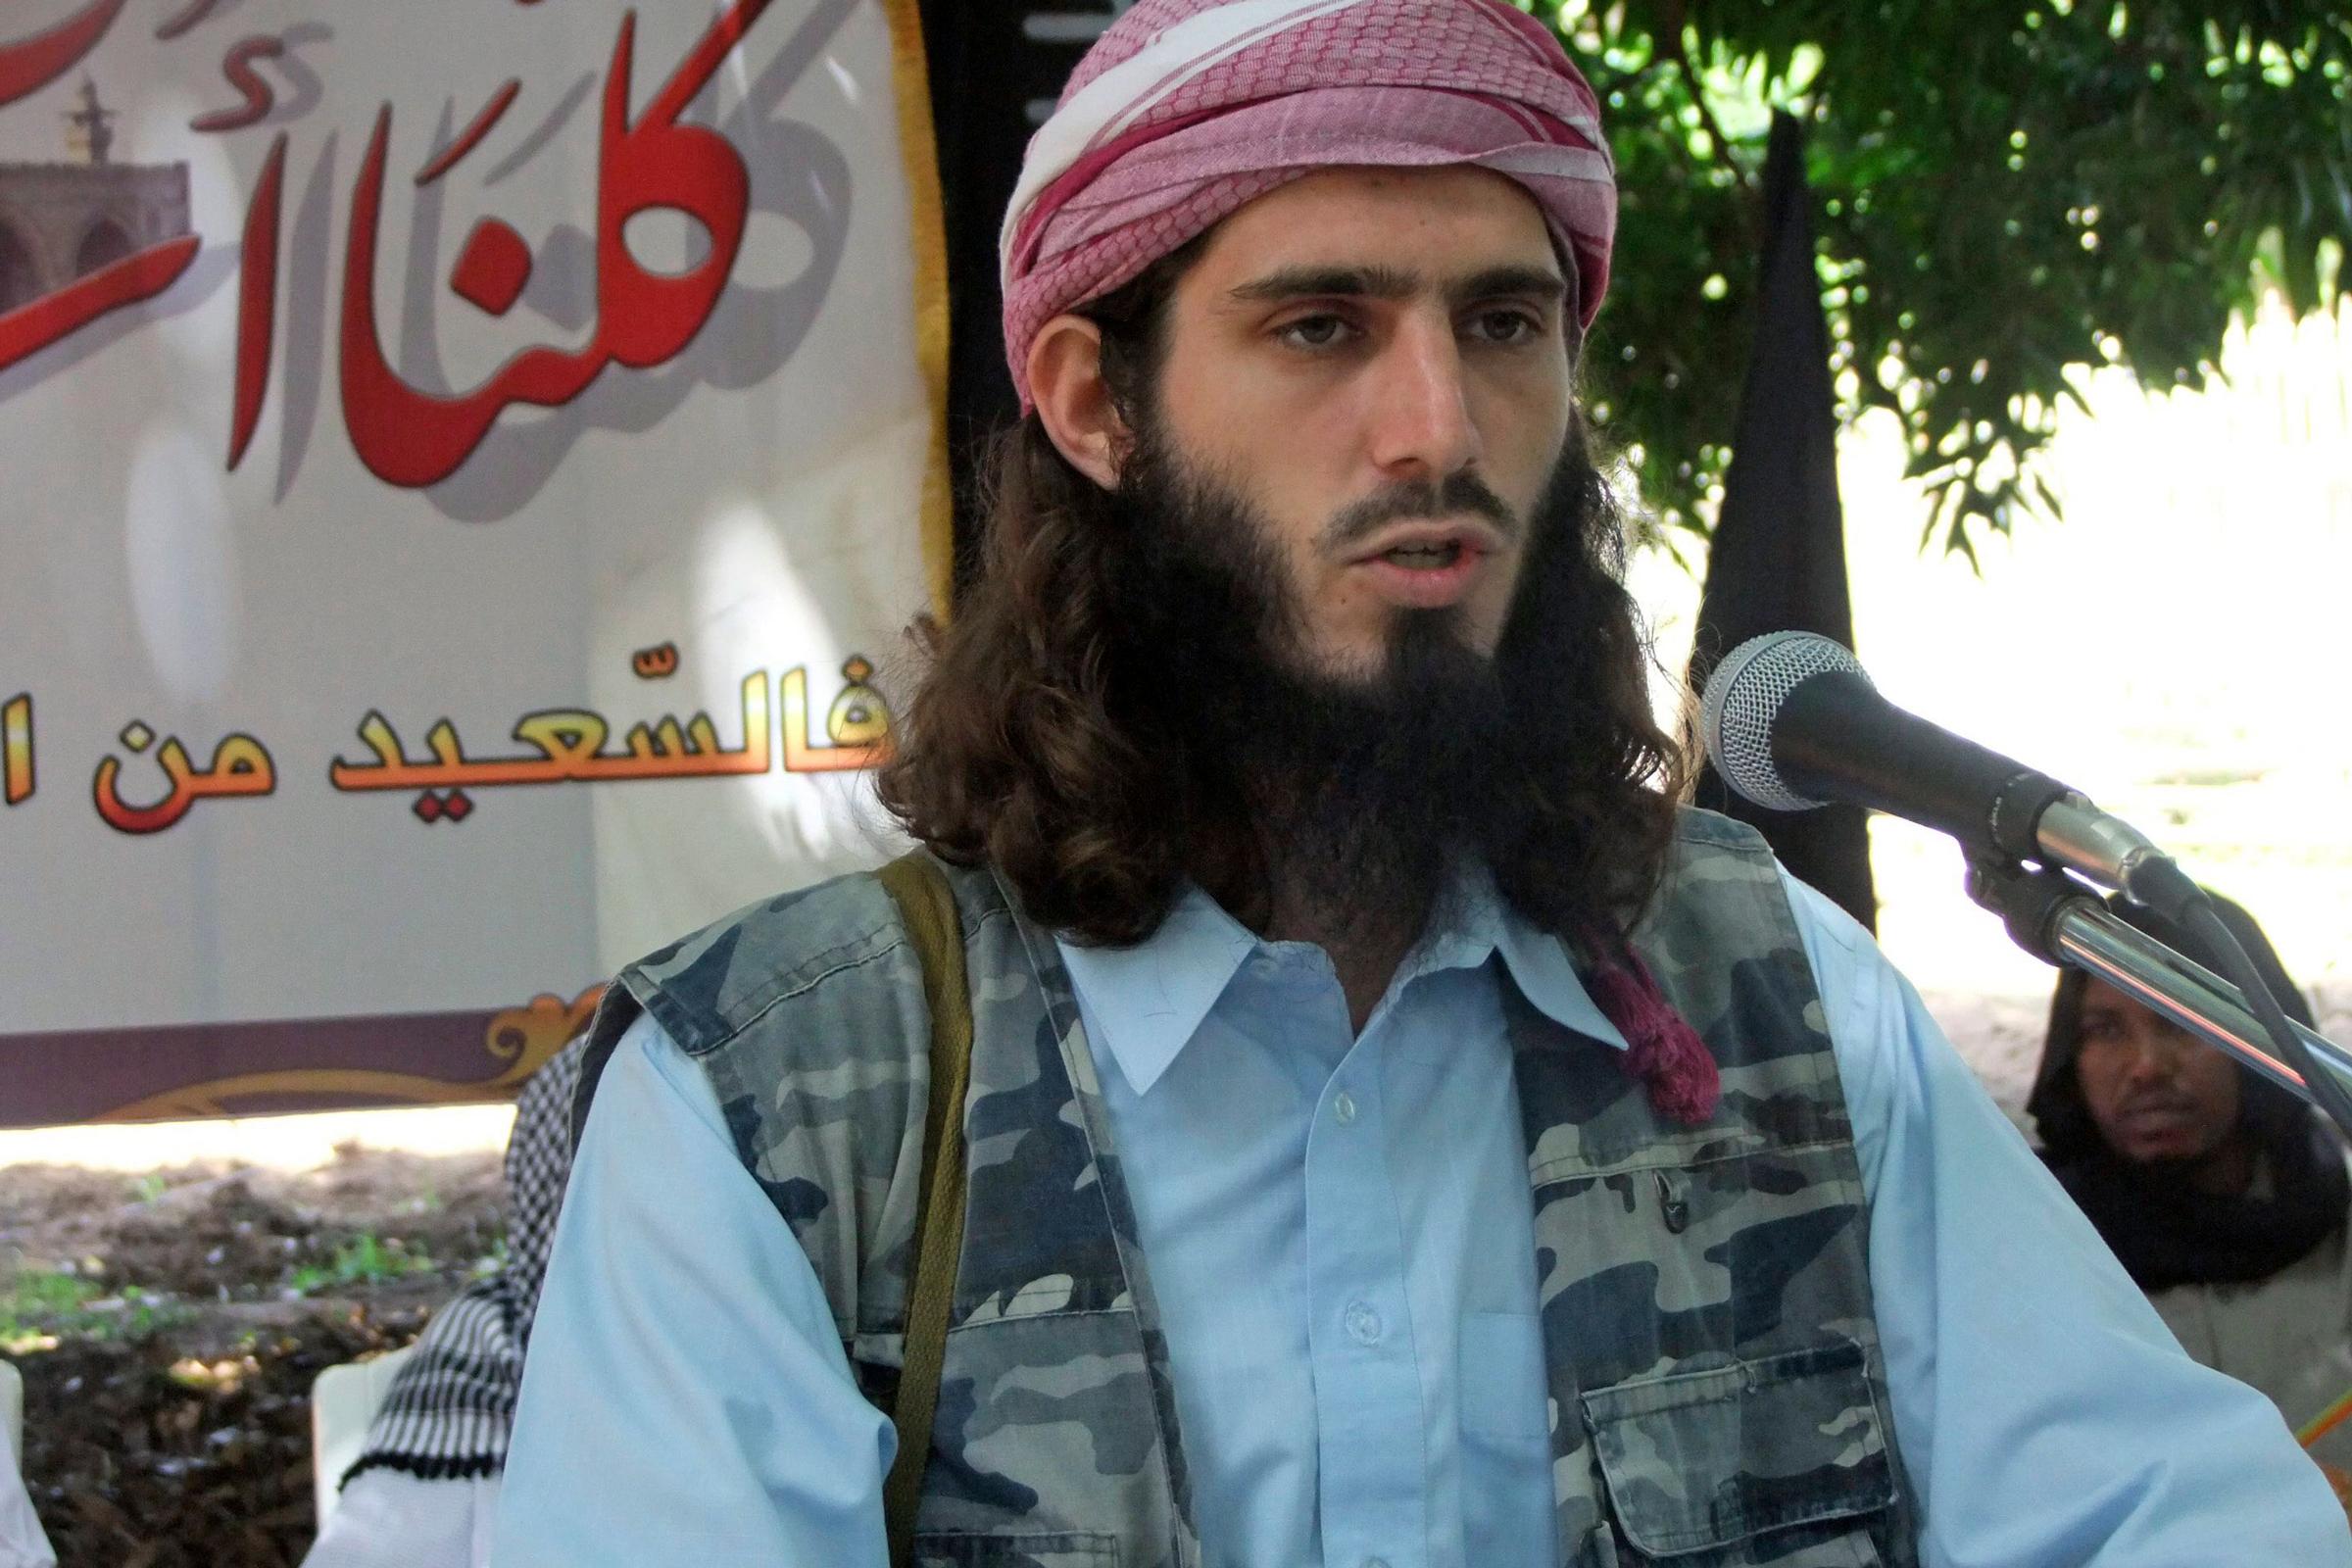 jihadist dating